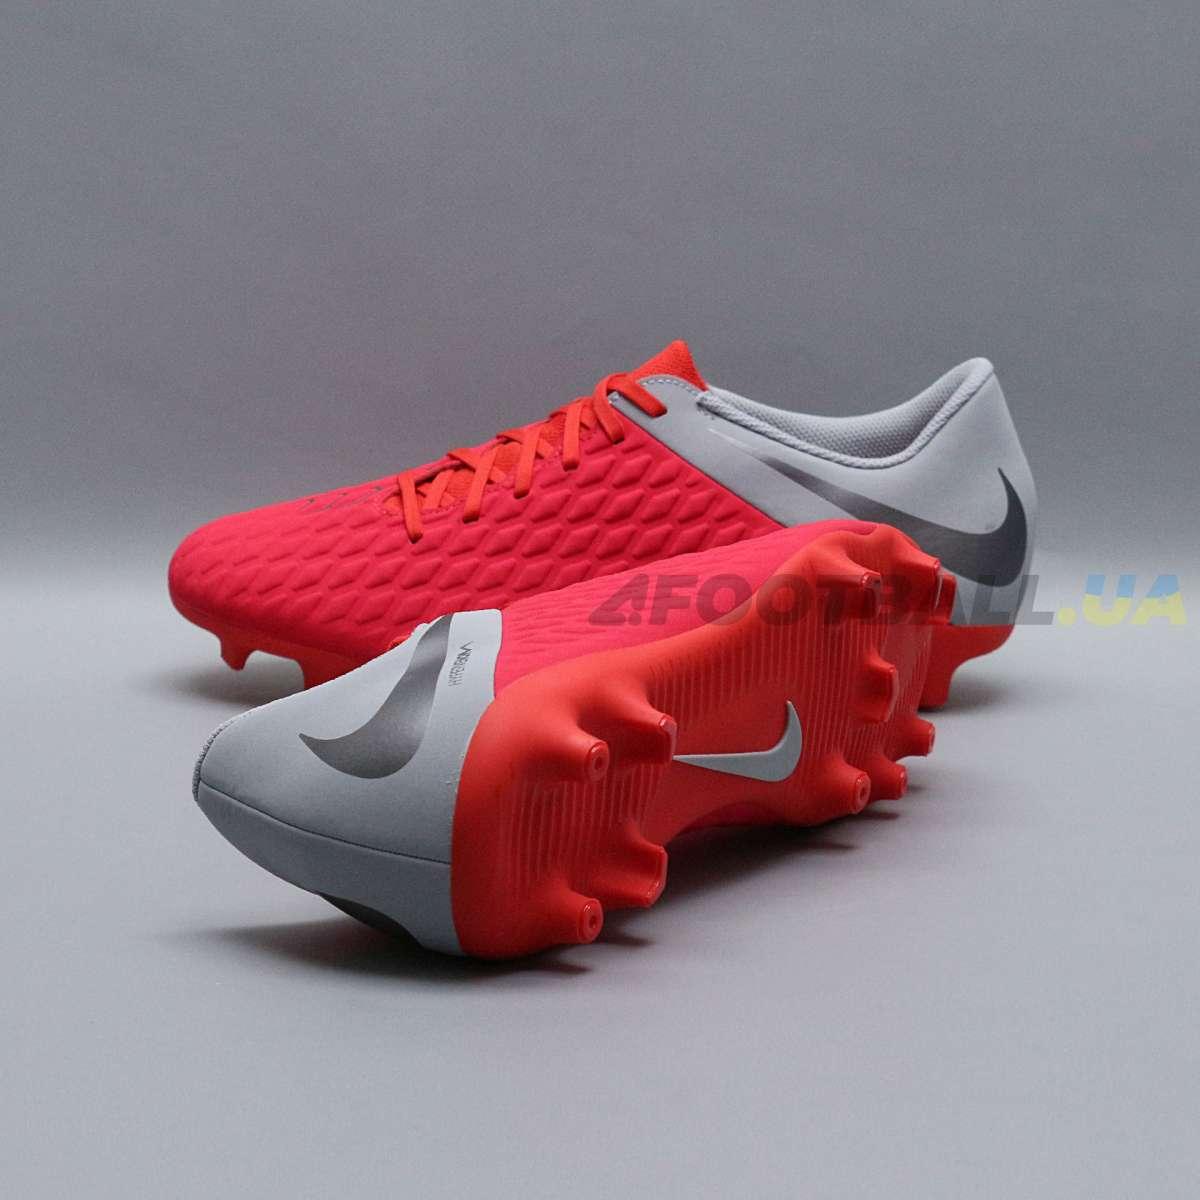 c5d0e6ec Бутсы Nike Hypervenom Phantom Club AJ4145-600 купить на 4football ...